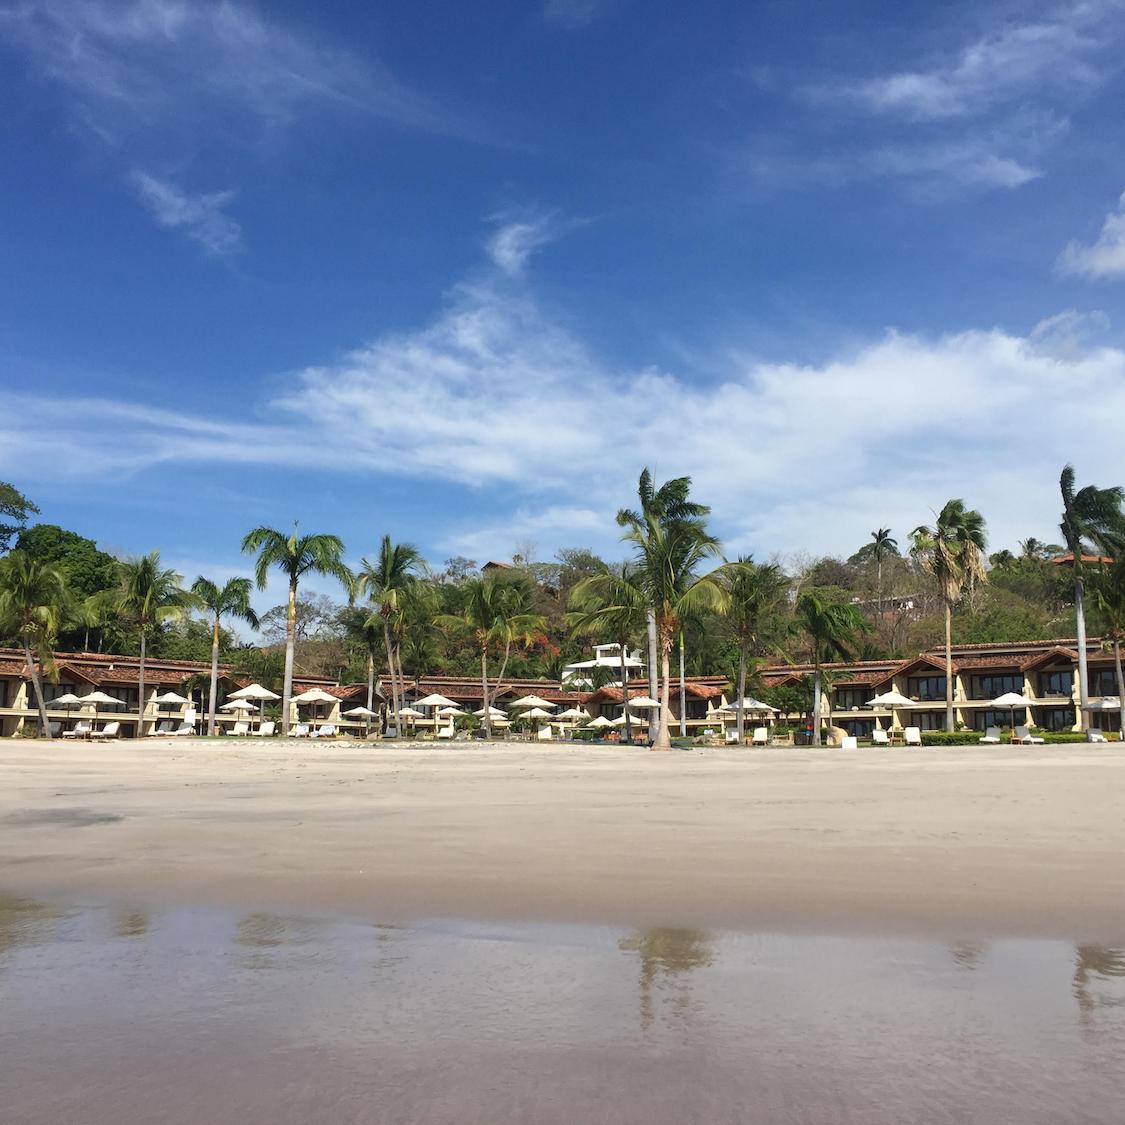 The Palms Costa Rica